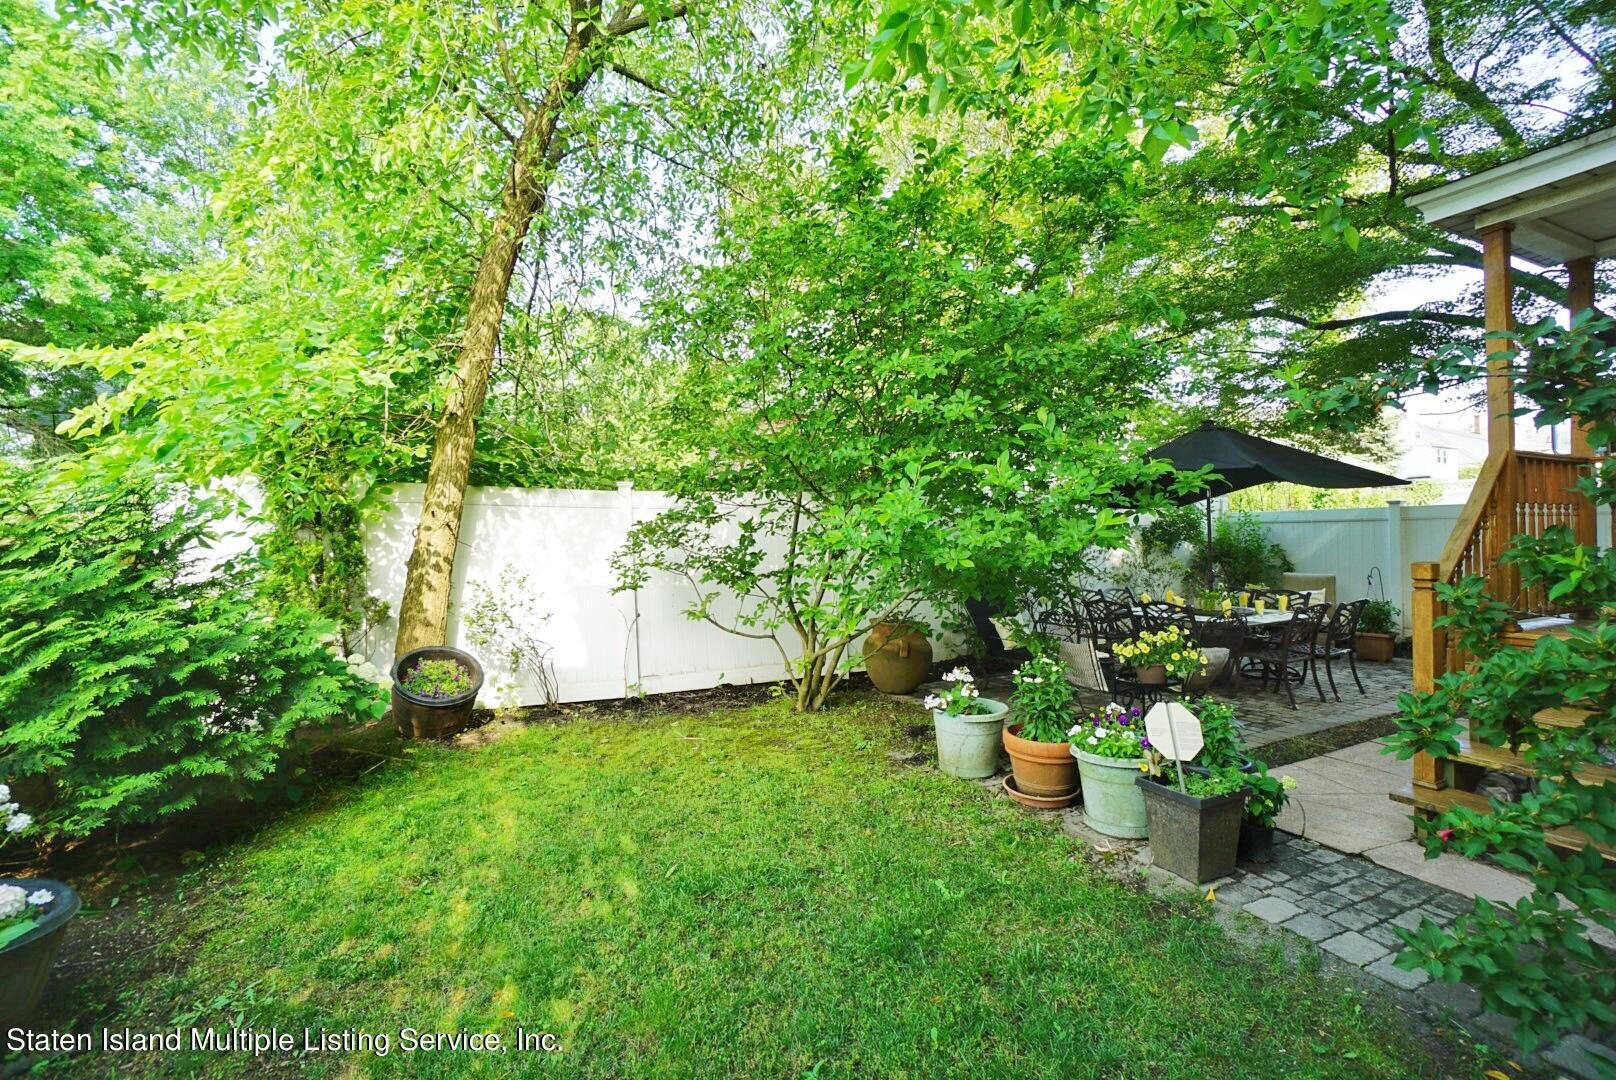 Single Family - Detached 311 Bement Avenue  Staten Island, NY 10310, MLS-1147133-43